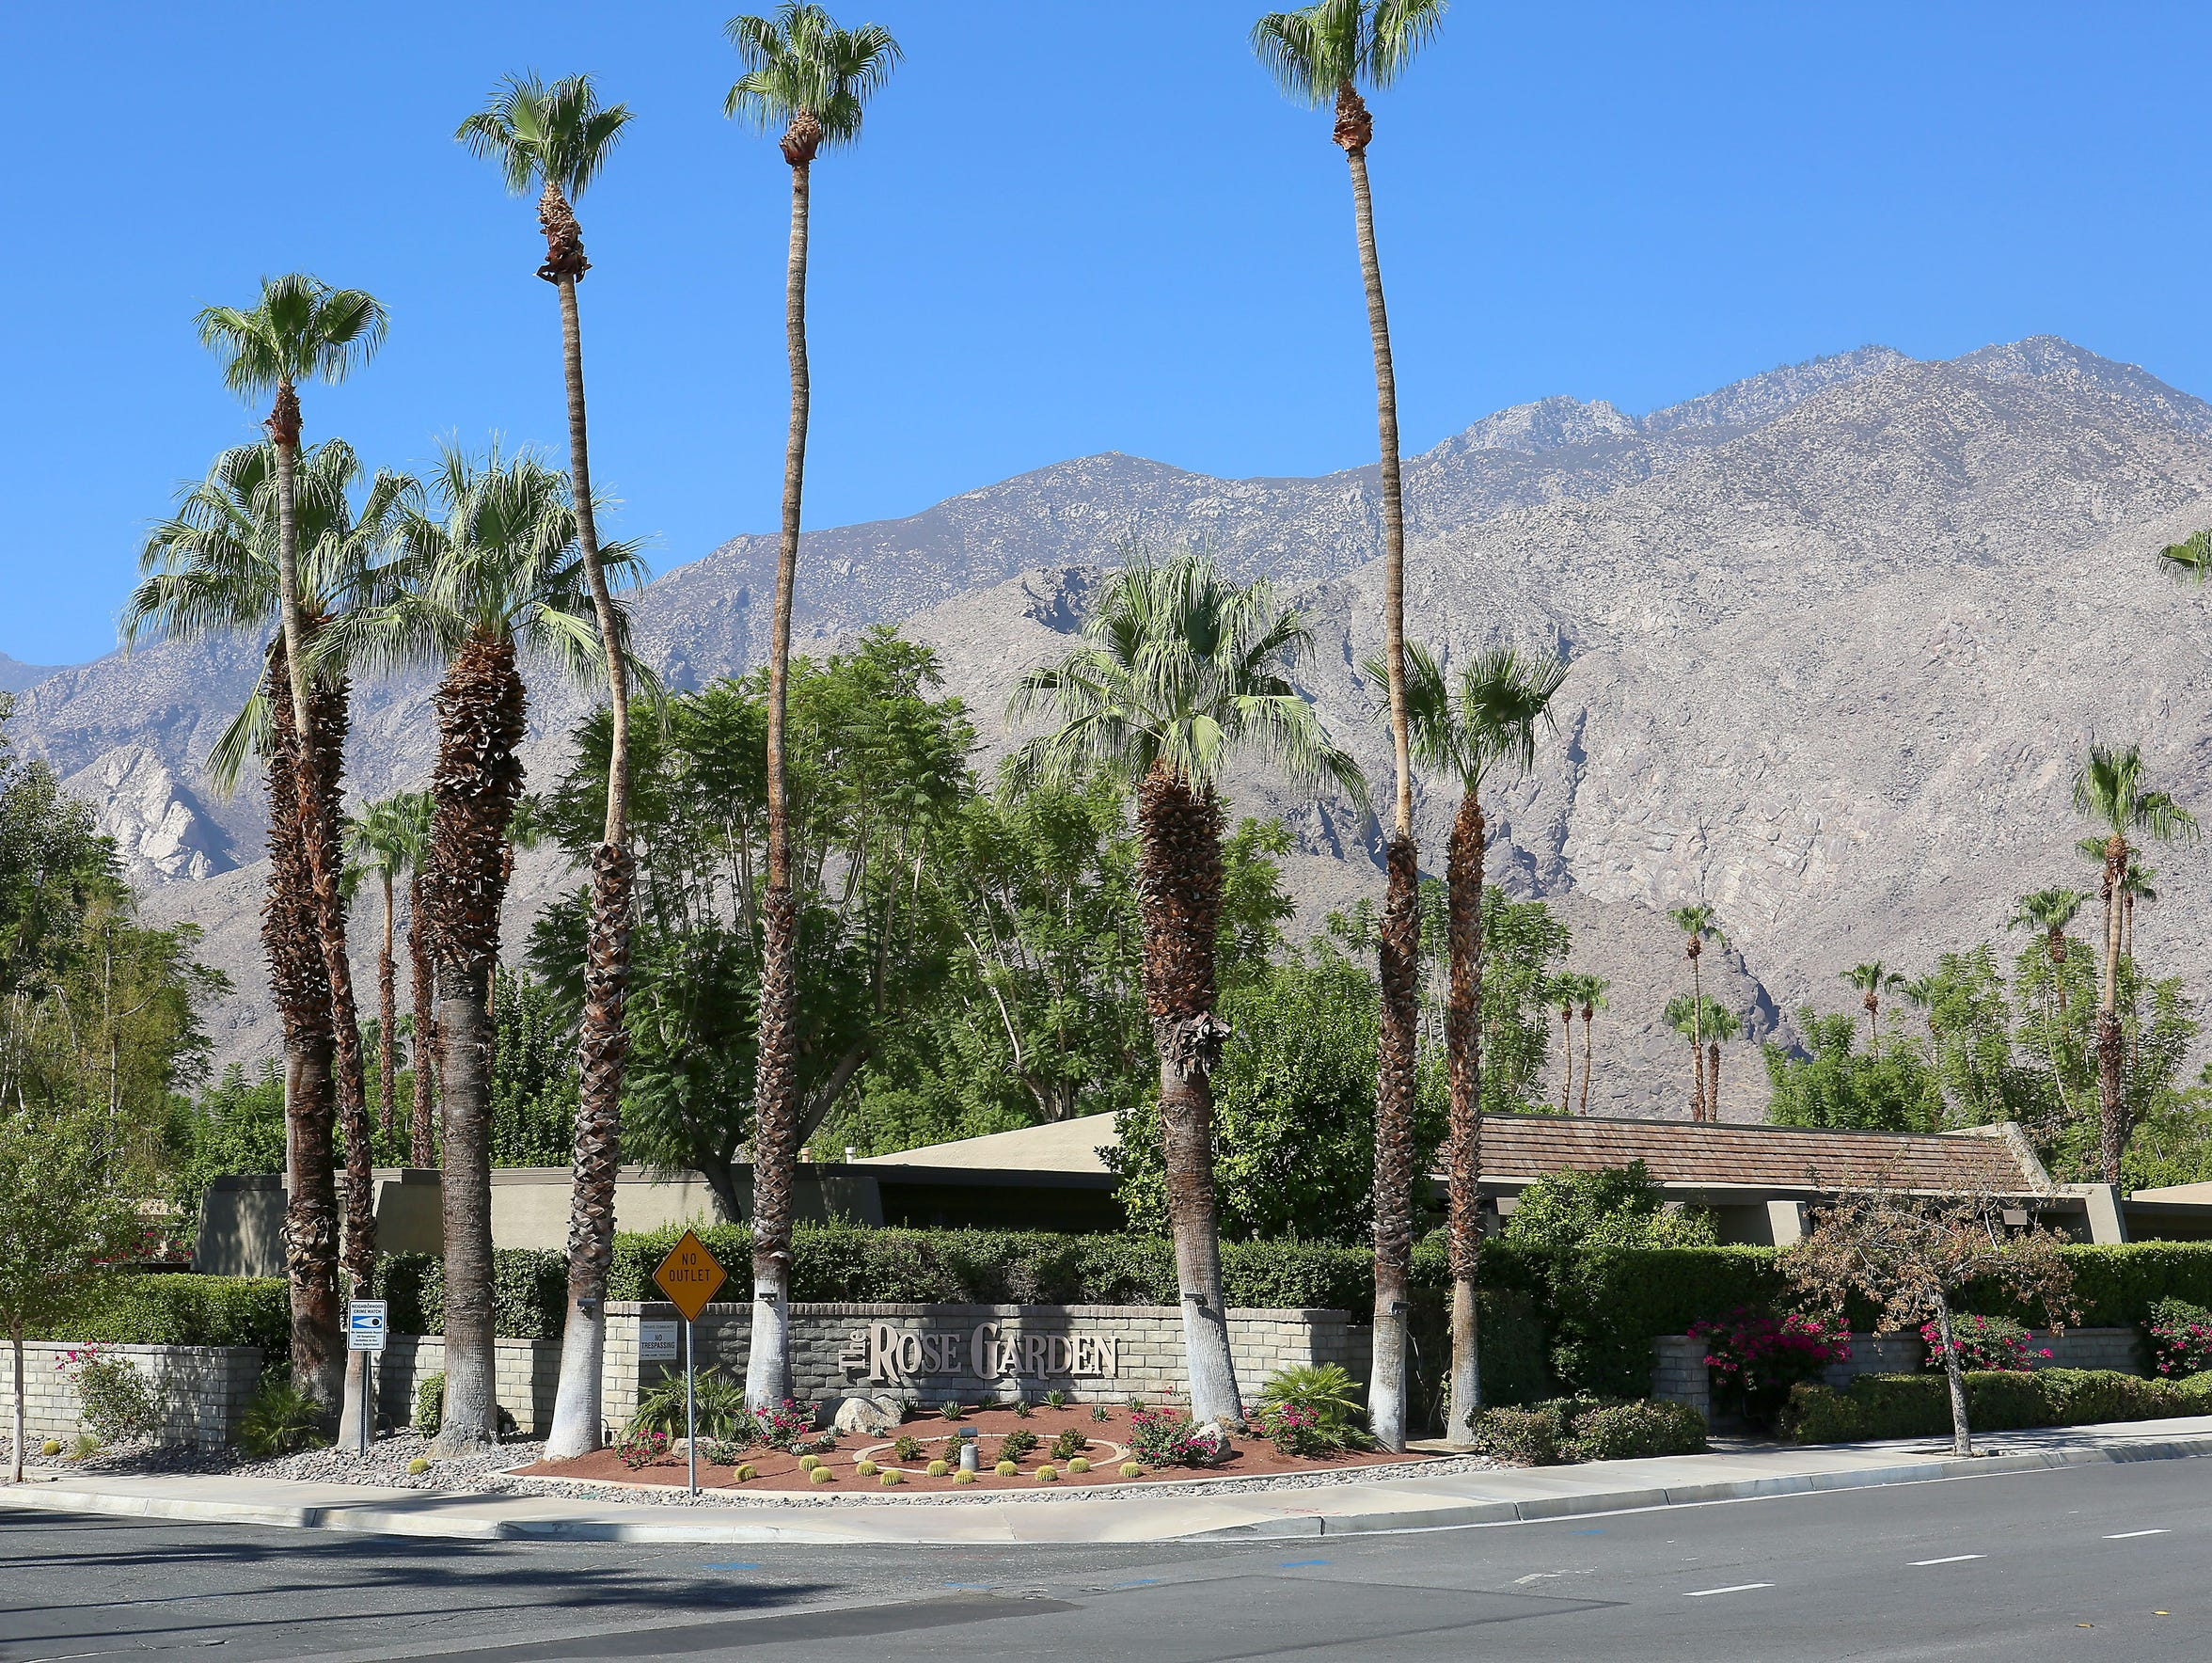 The Rose Garden neighborhood in Palm Springs.